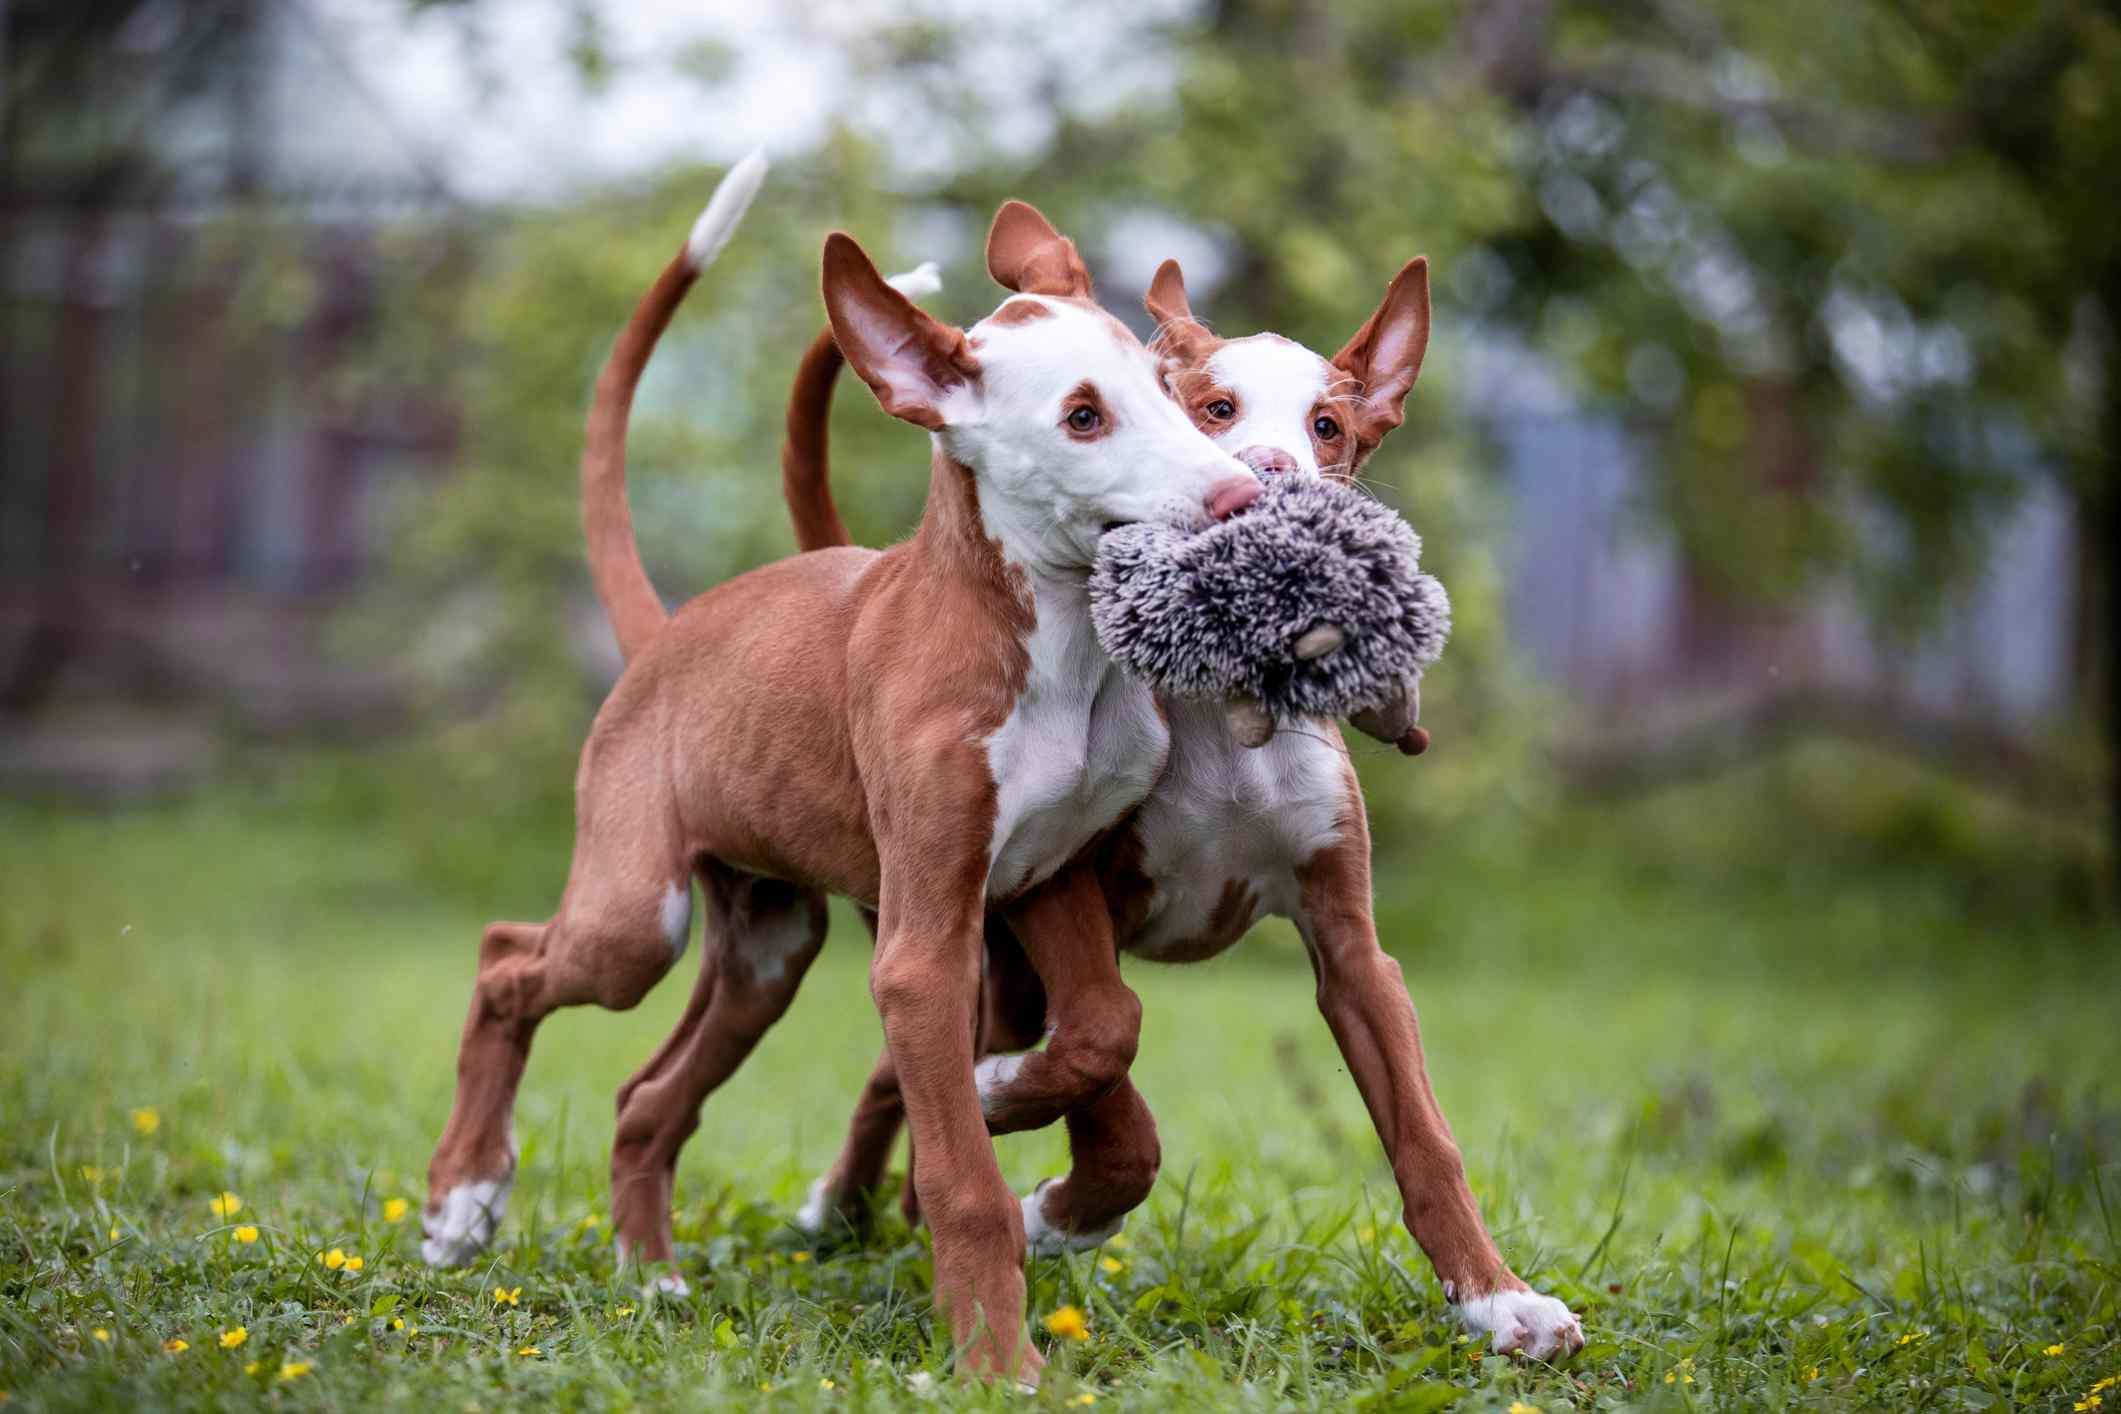 Two Ibizan hound puppies playing